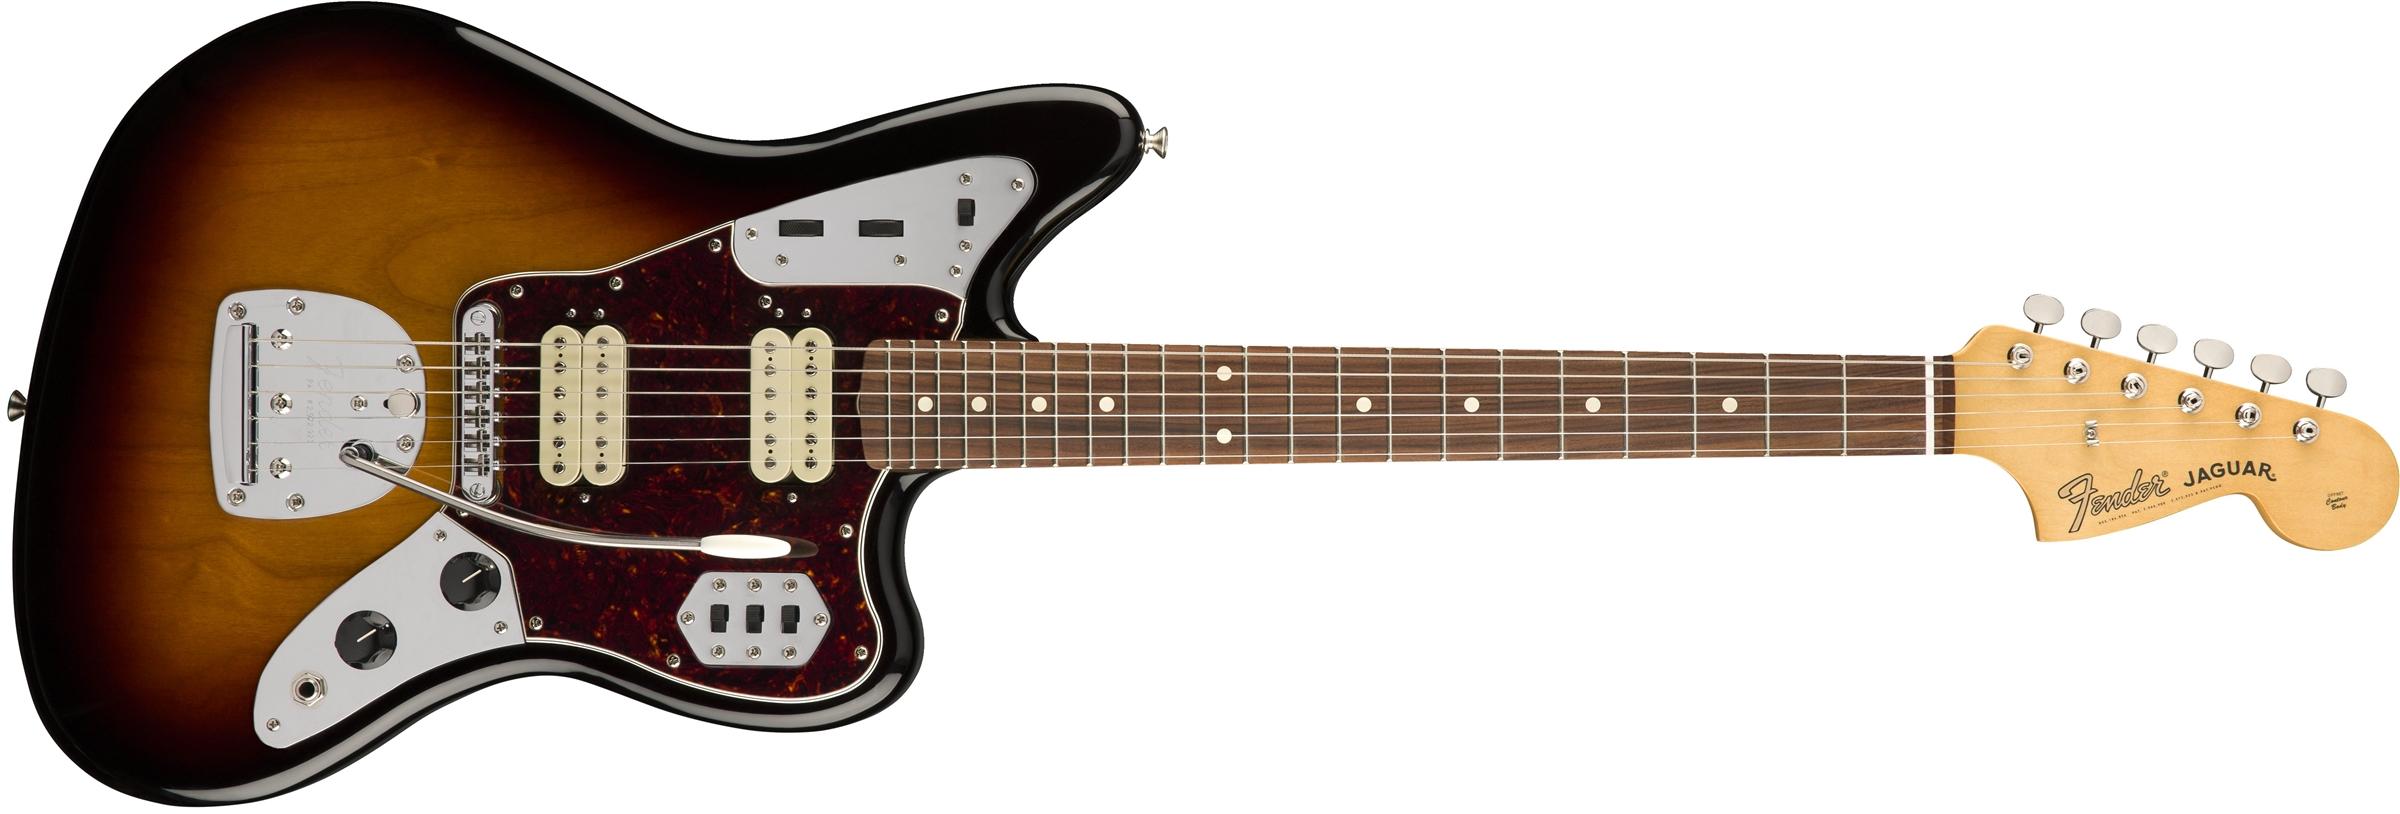 Fender Player Jaguar Hh Wiring Schematics Library Diagram Classic Special Electric Guitarsdesign